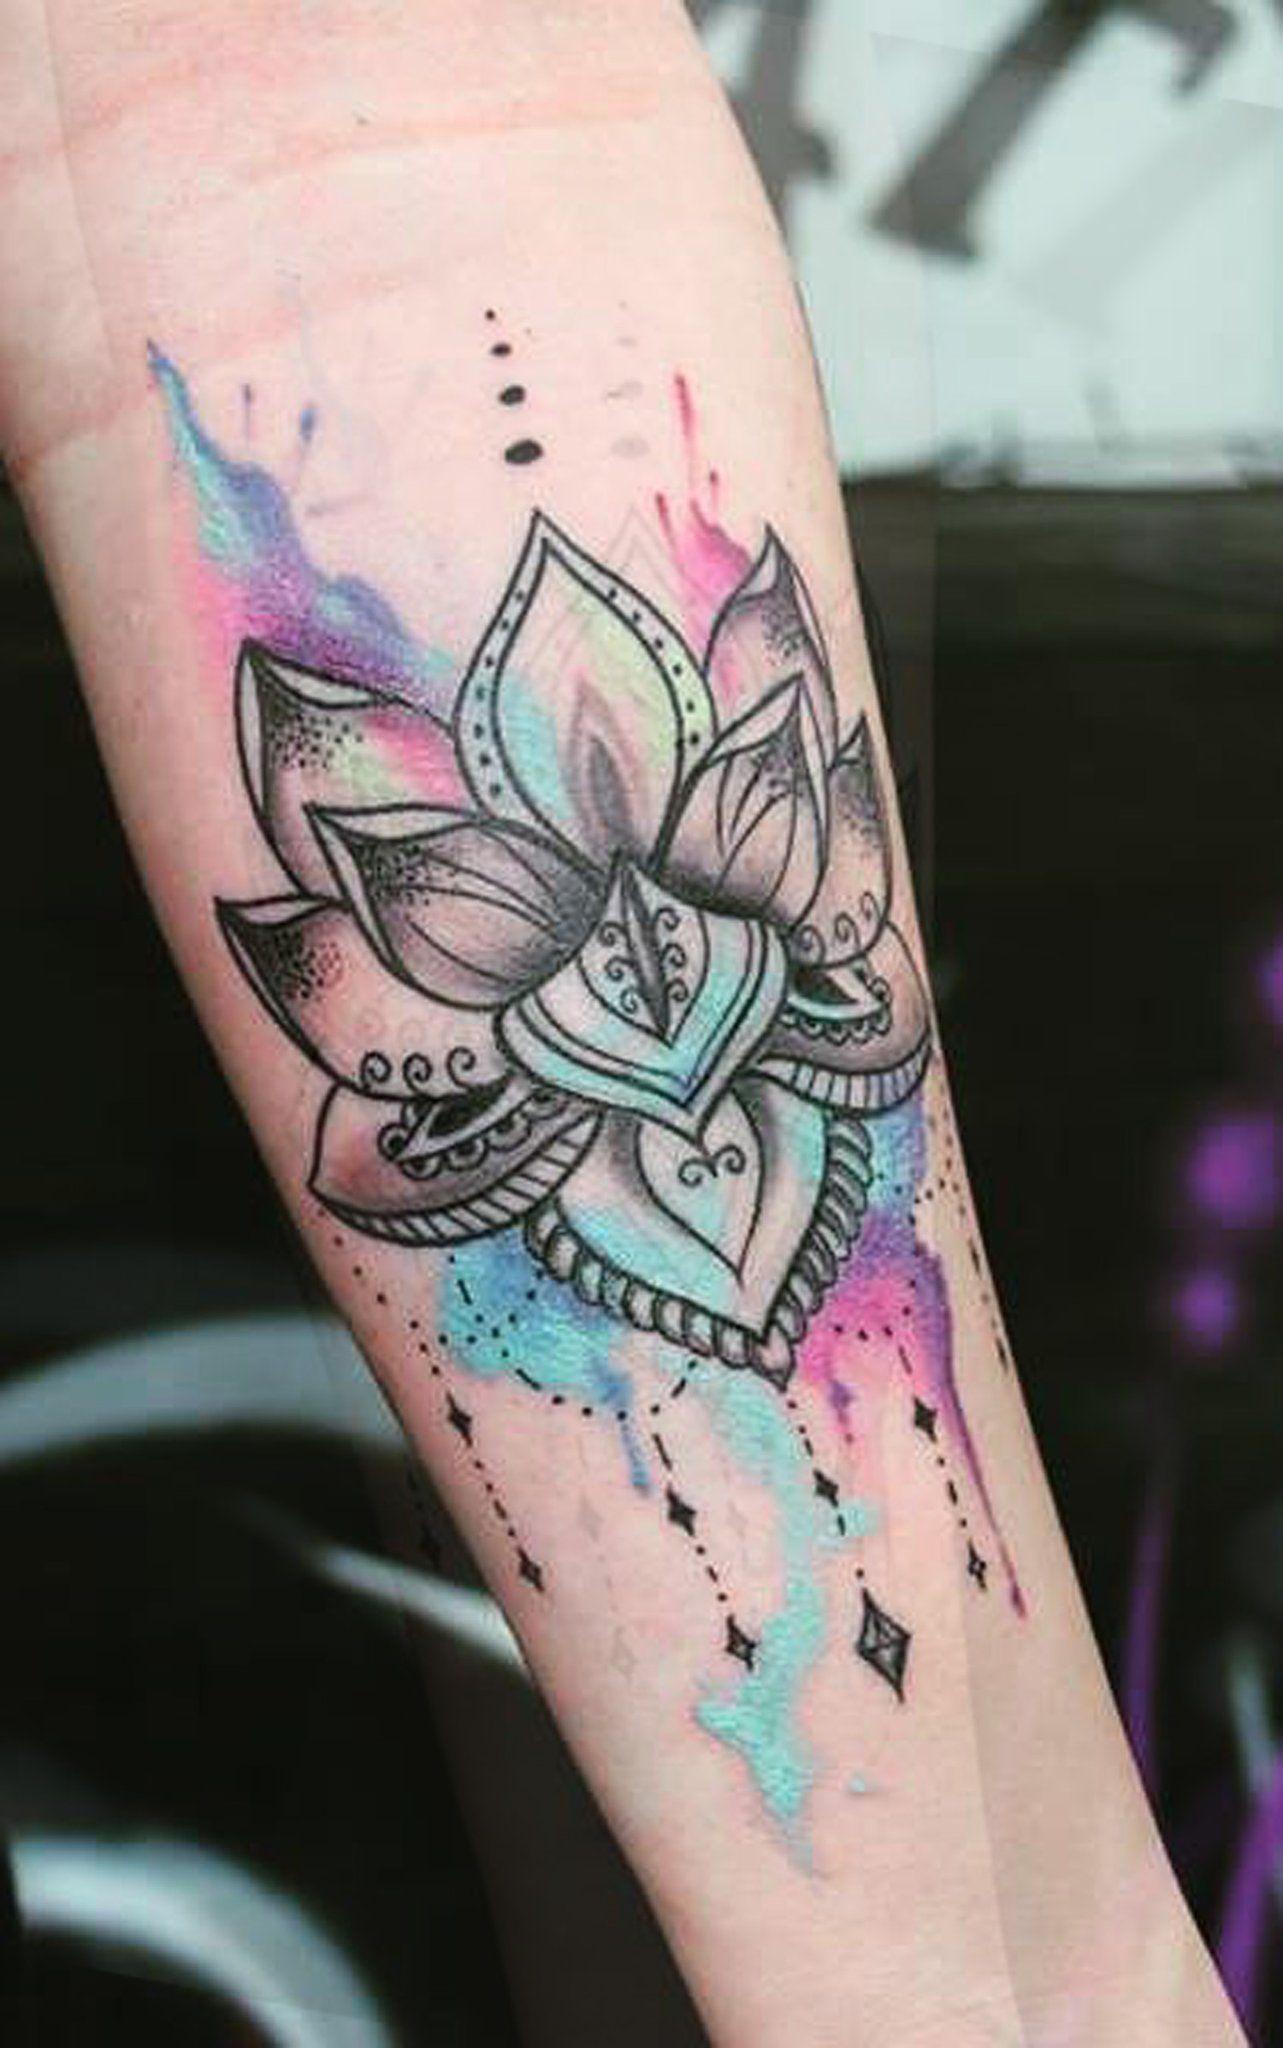 Watercolor Rainbow Colorful Lotus Mandala Chandelier Forearm Tattoo Ideas For Women Ideas Coloridas Del Tat Wrist Tattoos Girls Flower Wrist Tattoos Tattoos